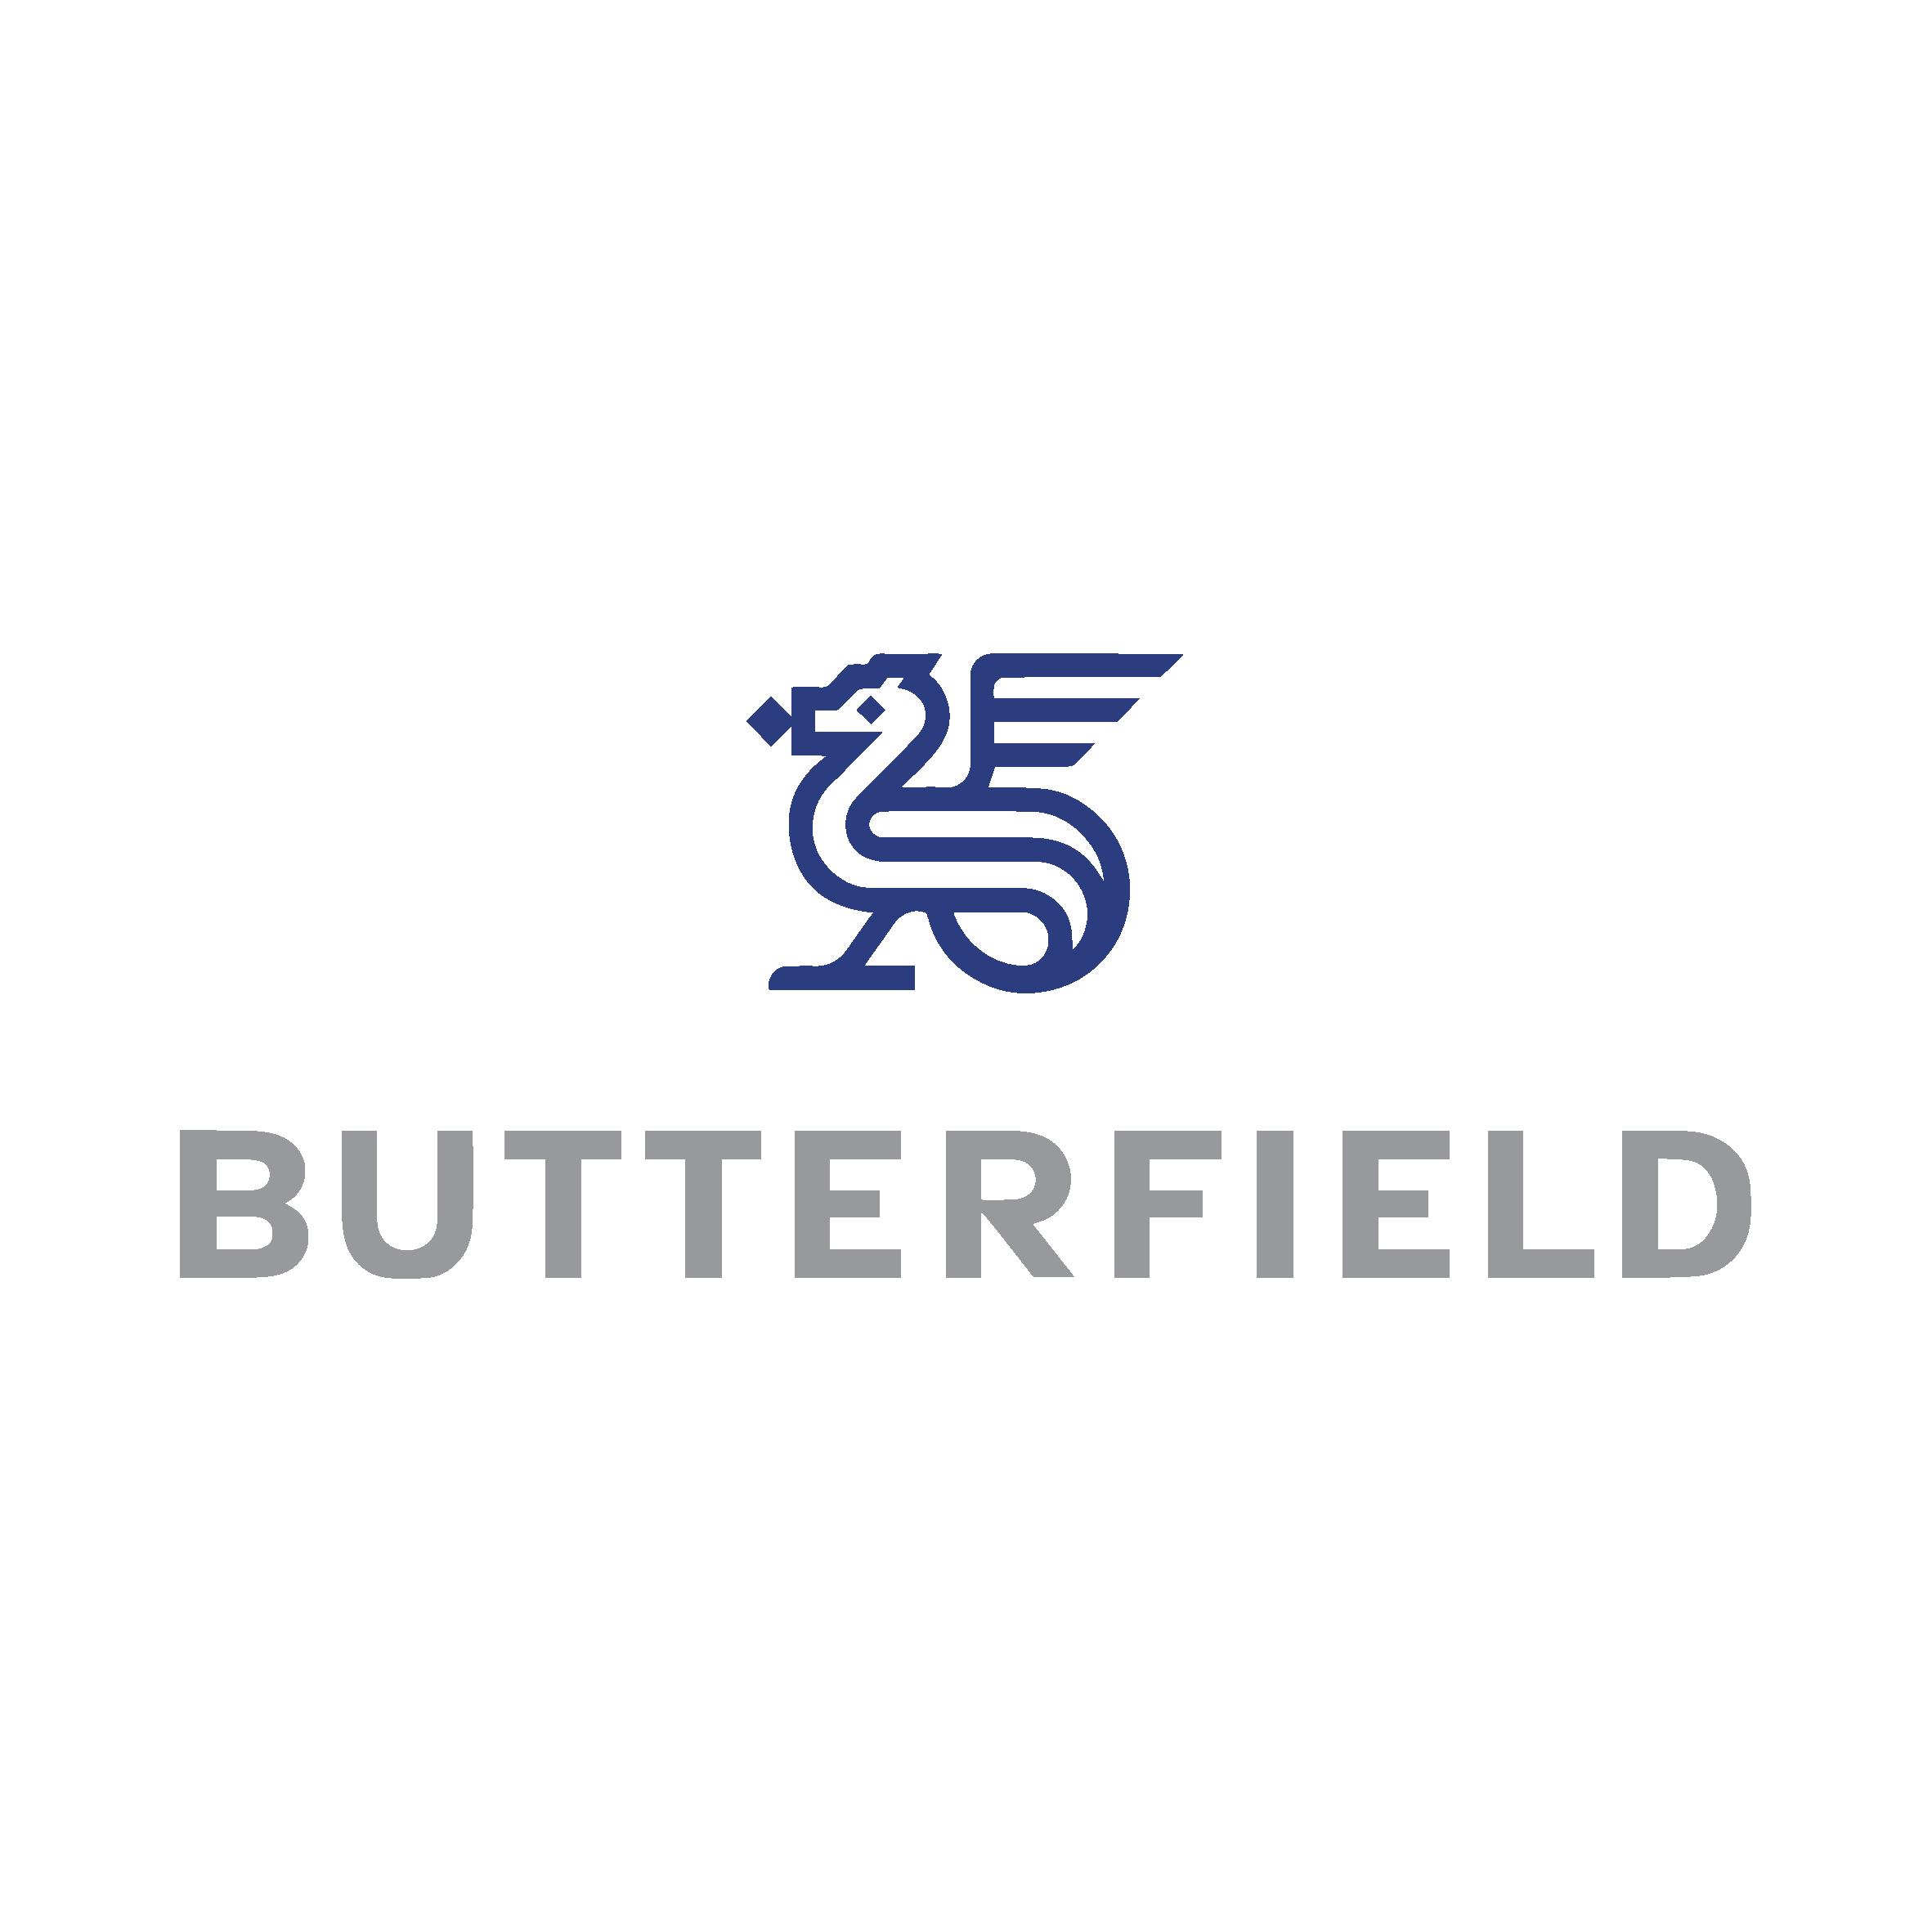 Butterfield Bank Limited Logo.